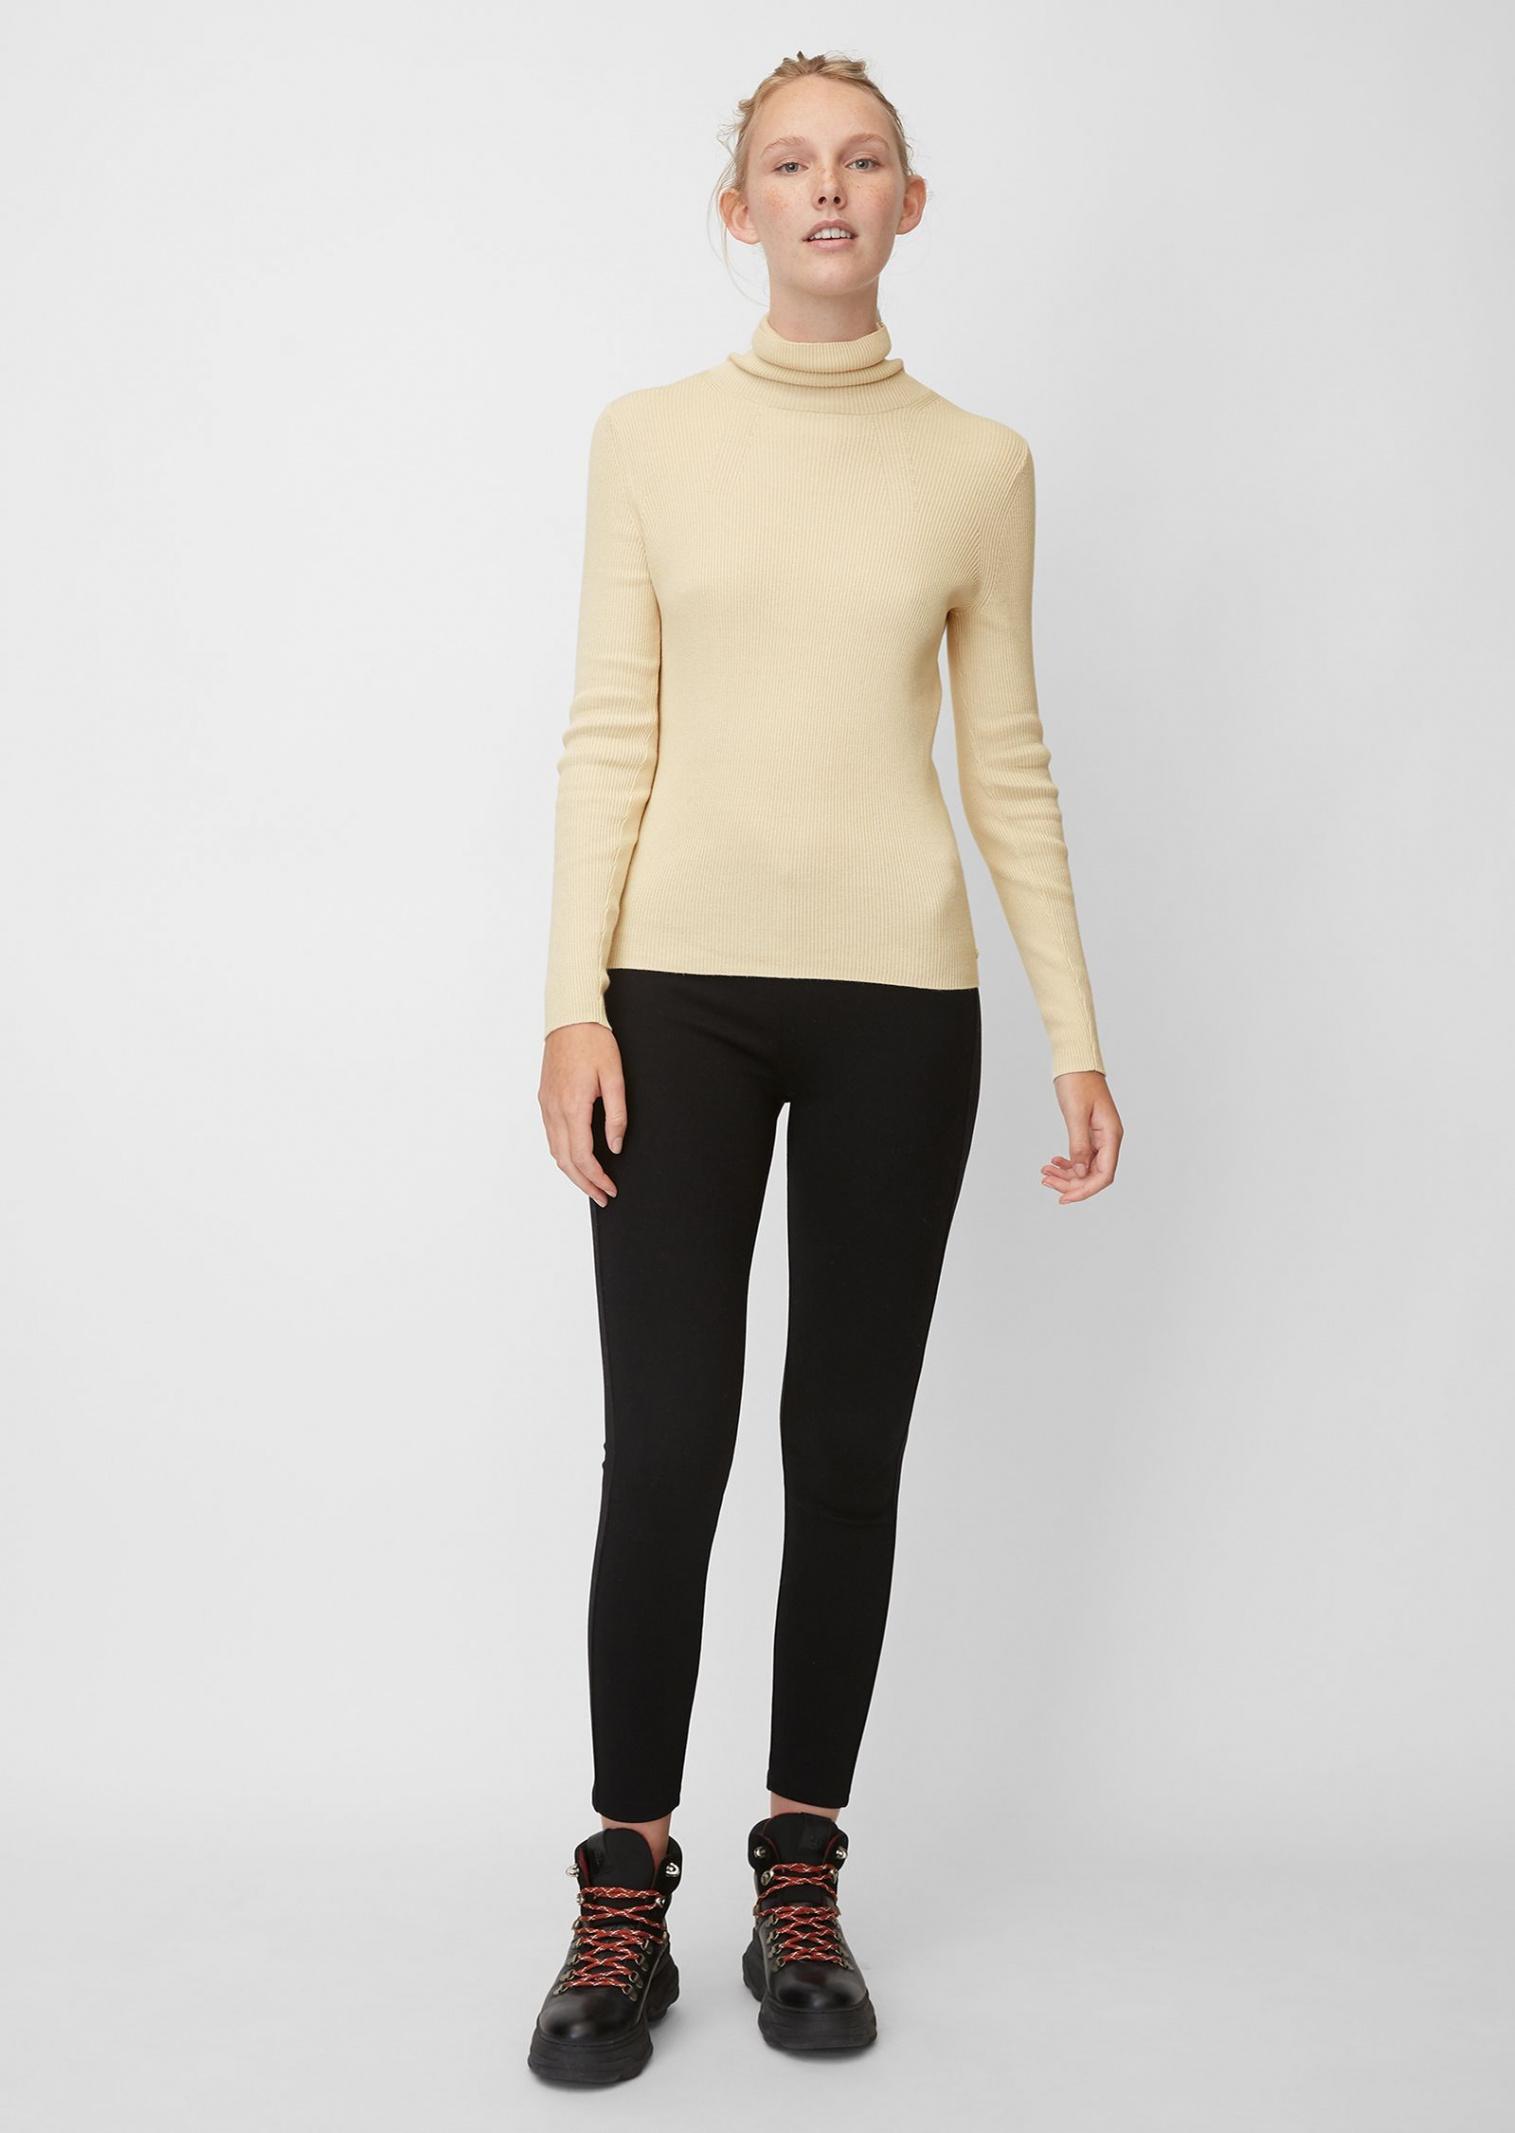 Кофты и свитера женские MARC O'POLO модель PF3858 приобрести, 2017